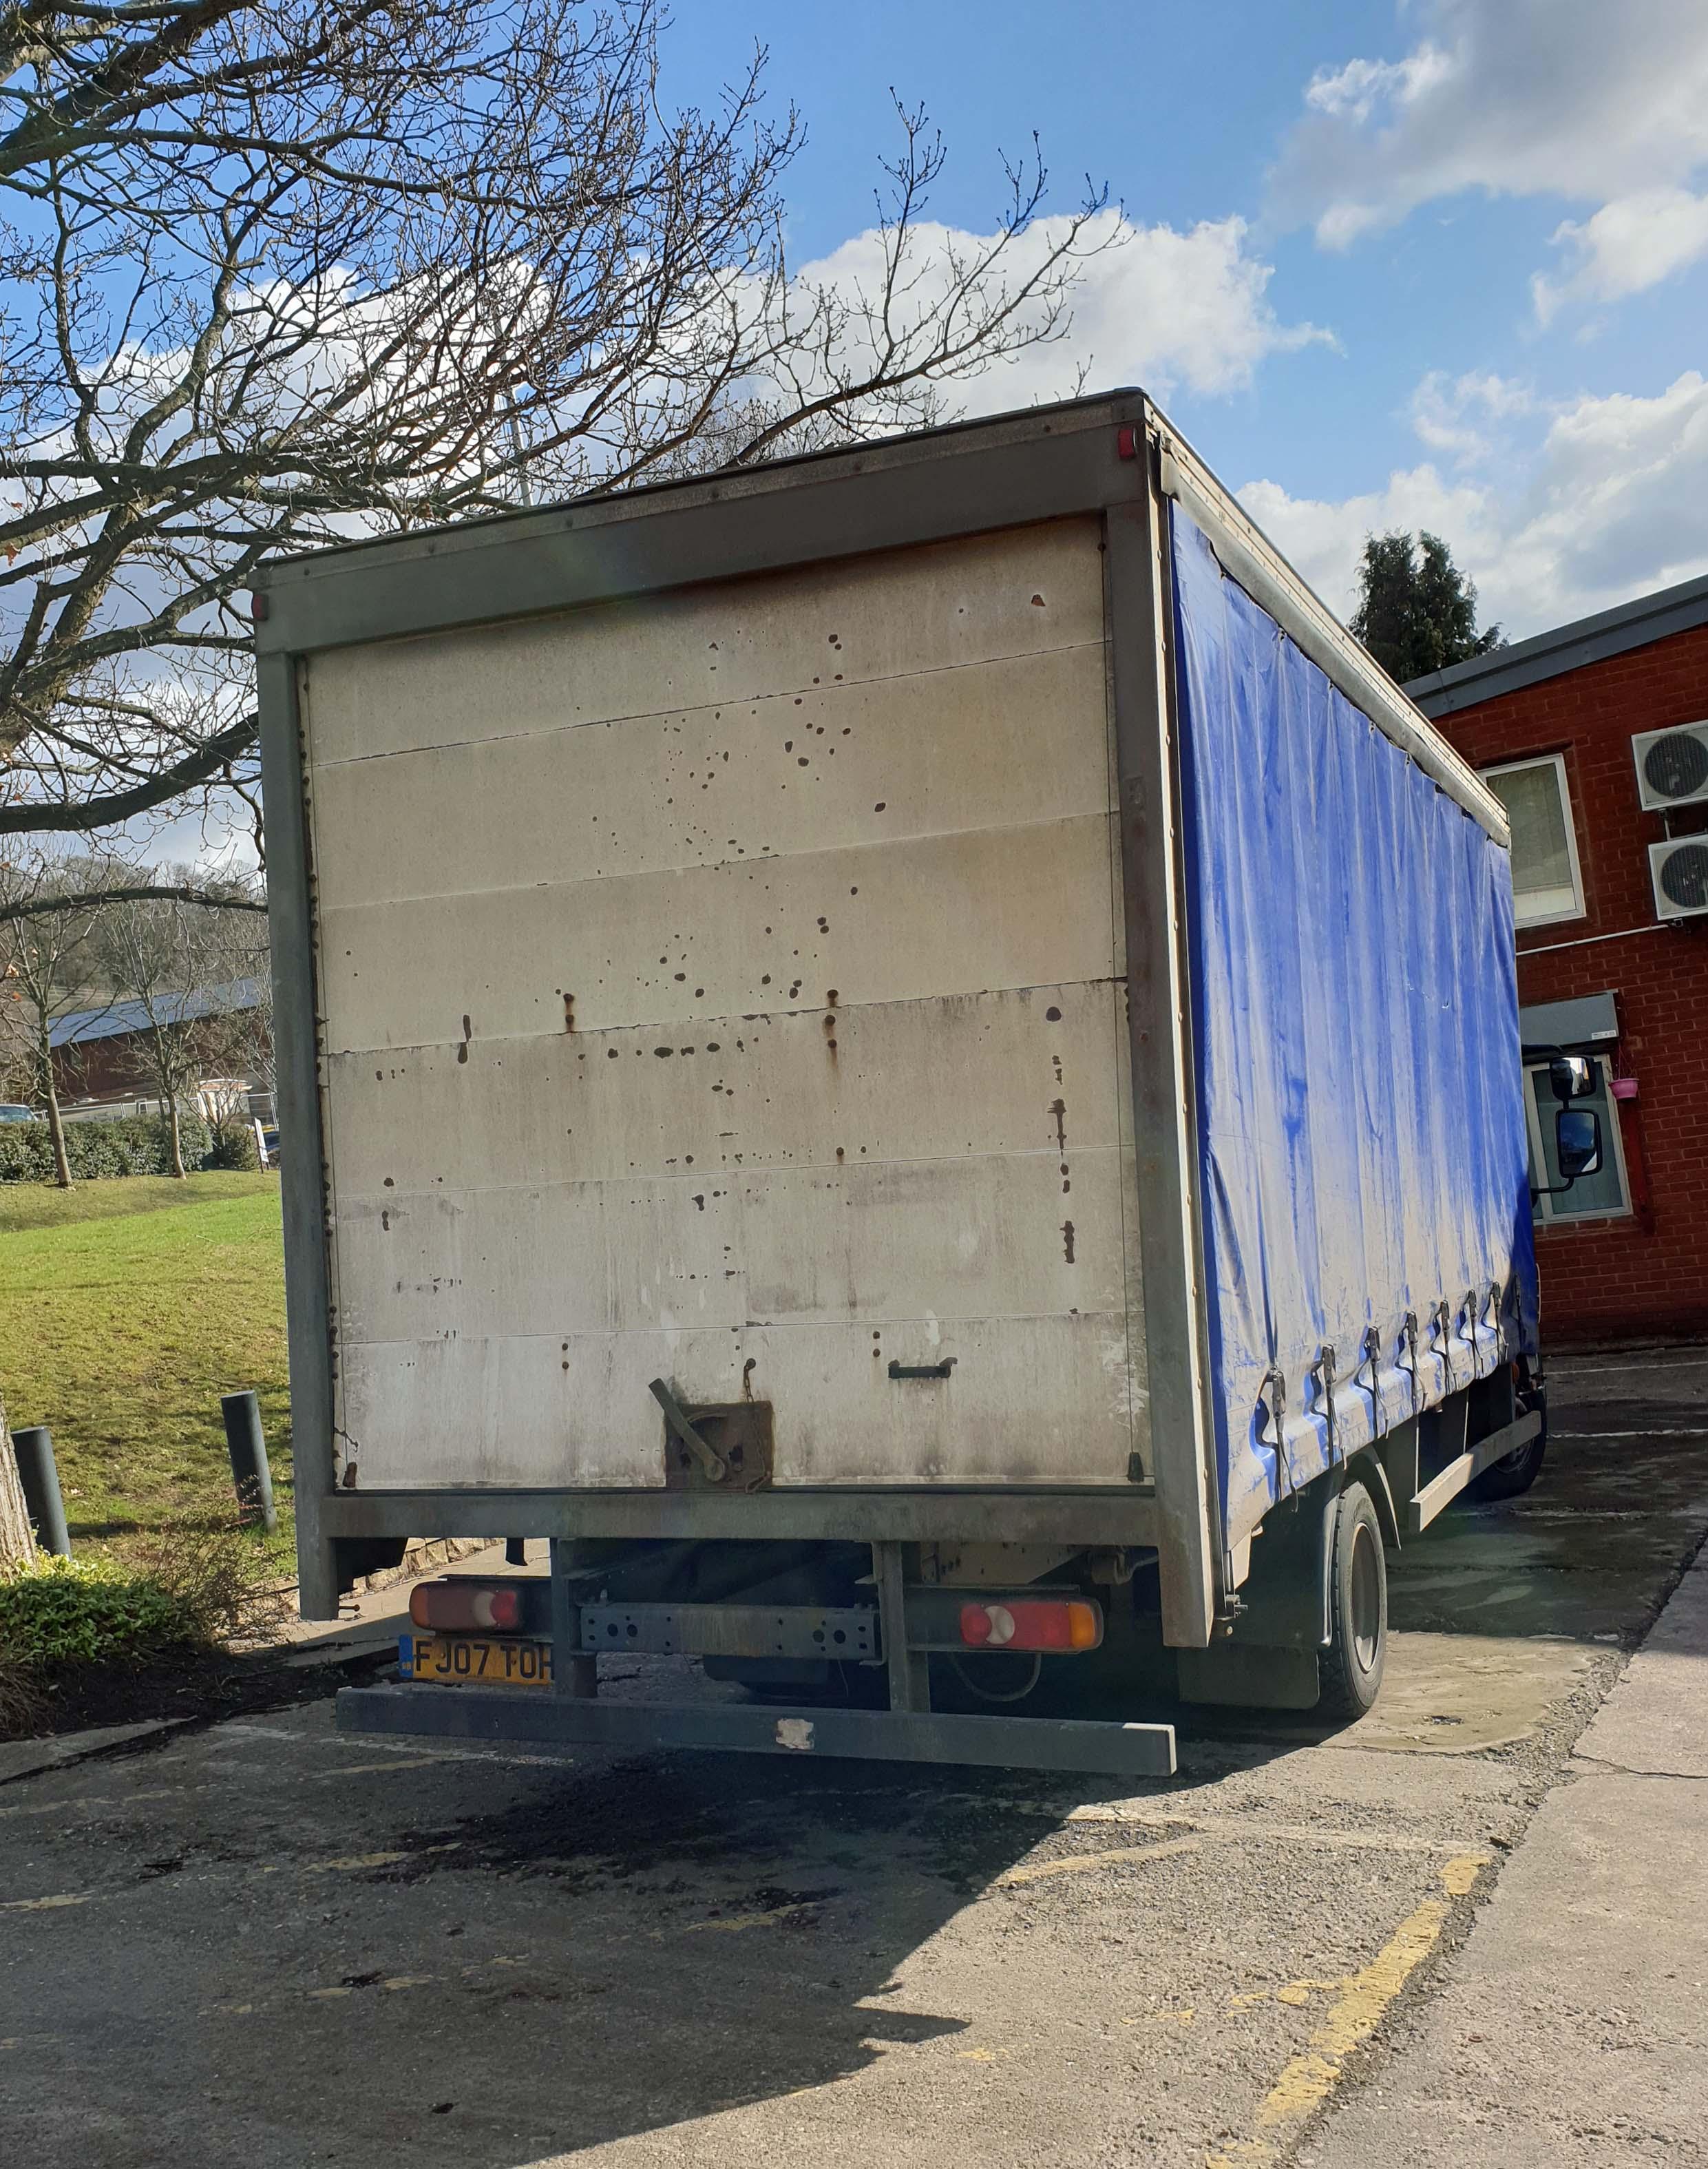 A DAF FA LF45.160 08 E 4500cc 4x2 7.5-Tonne Curtainside Truck, Registration No. FJ07 TOH, First - Image 3 of 9